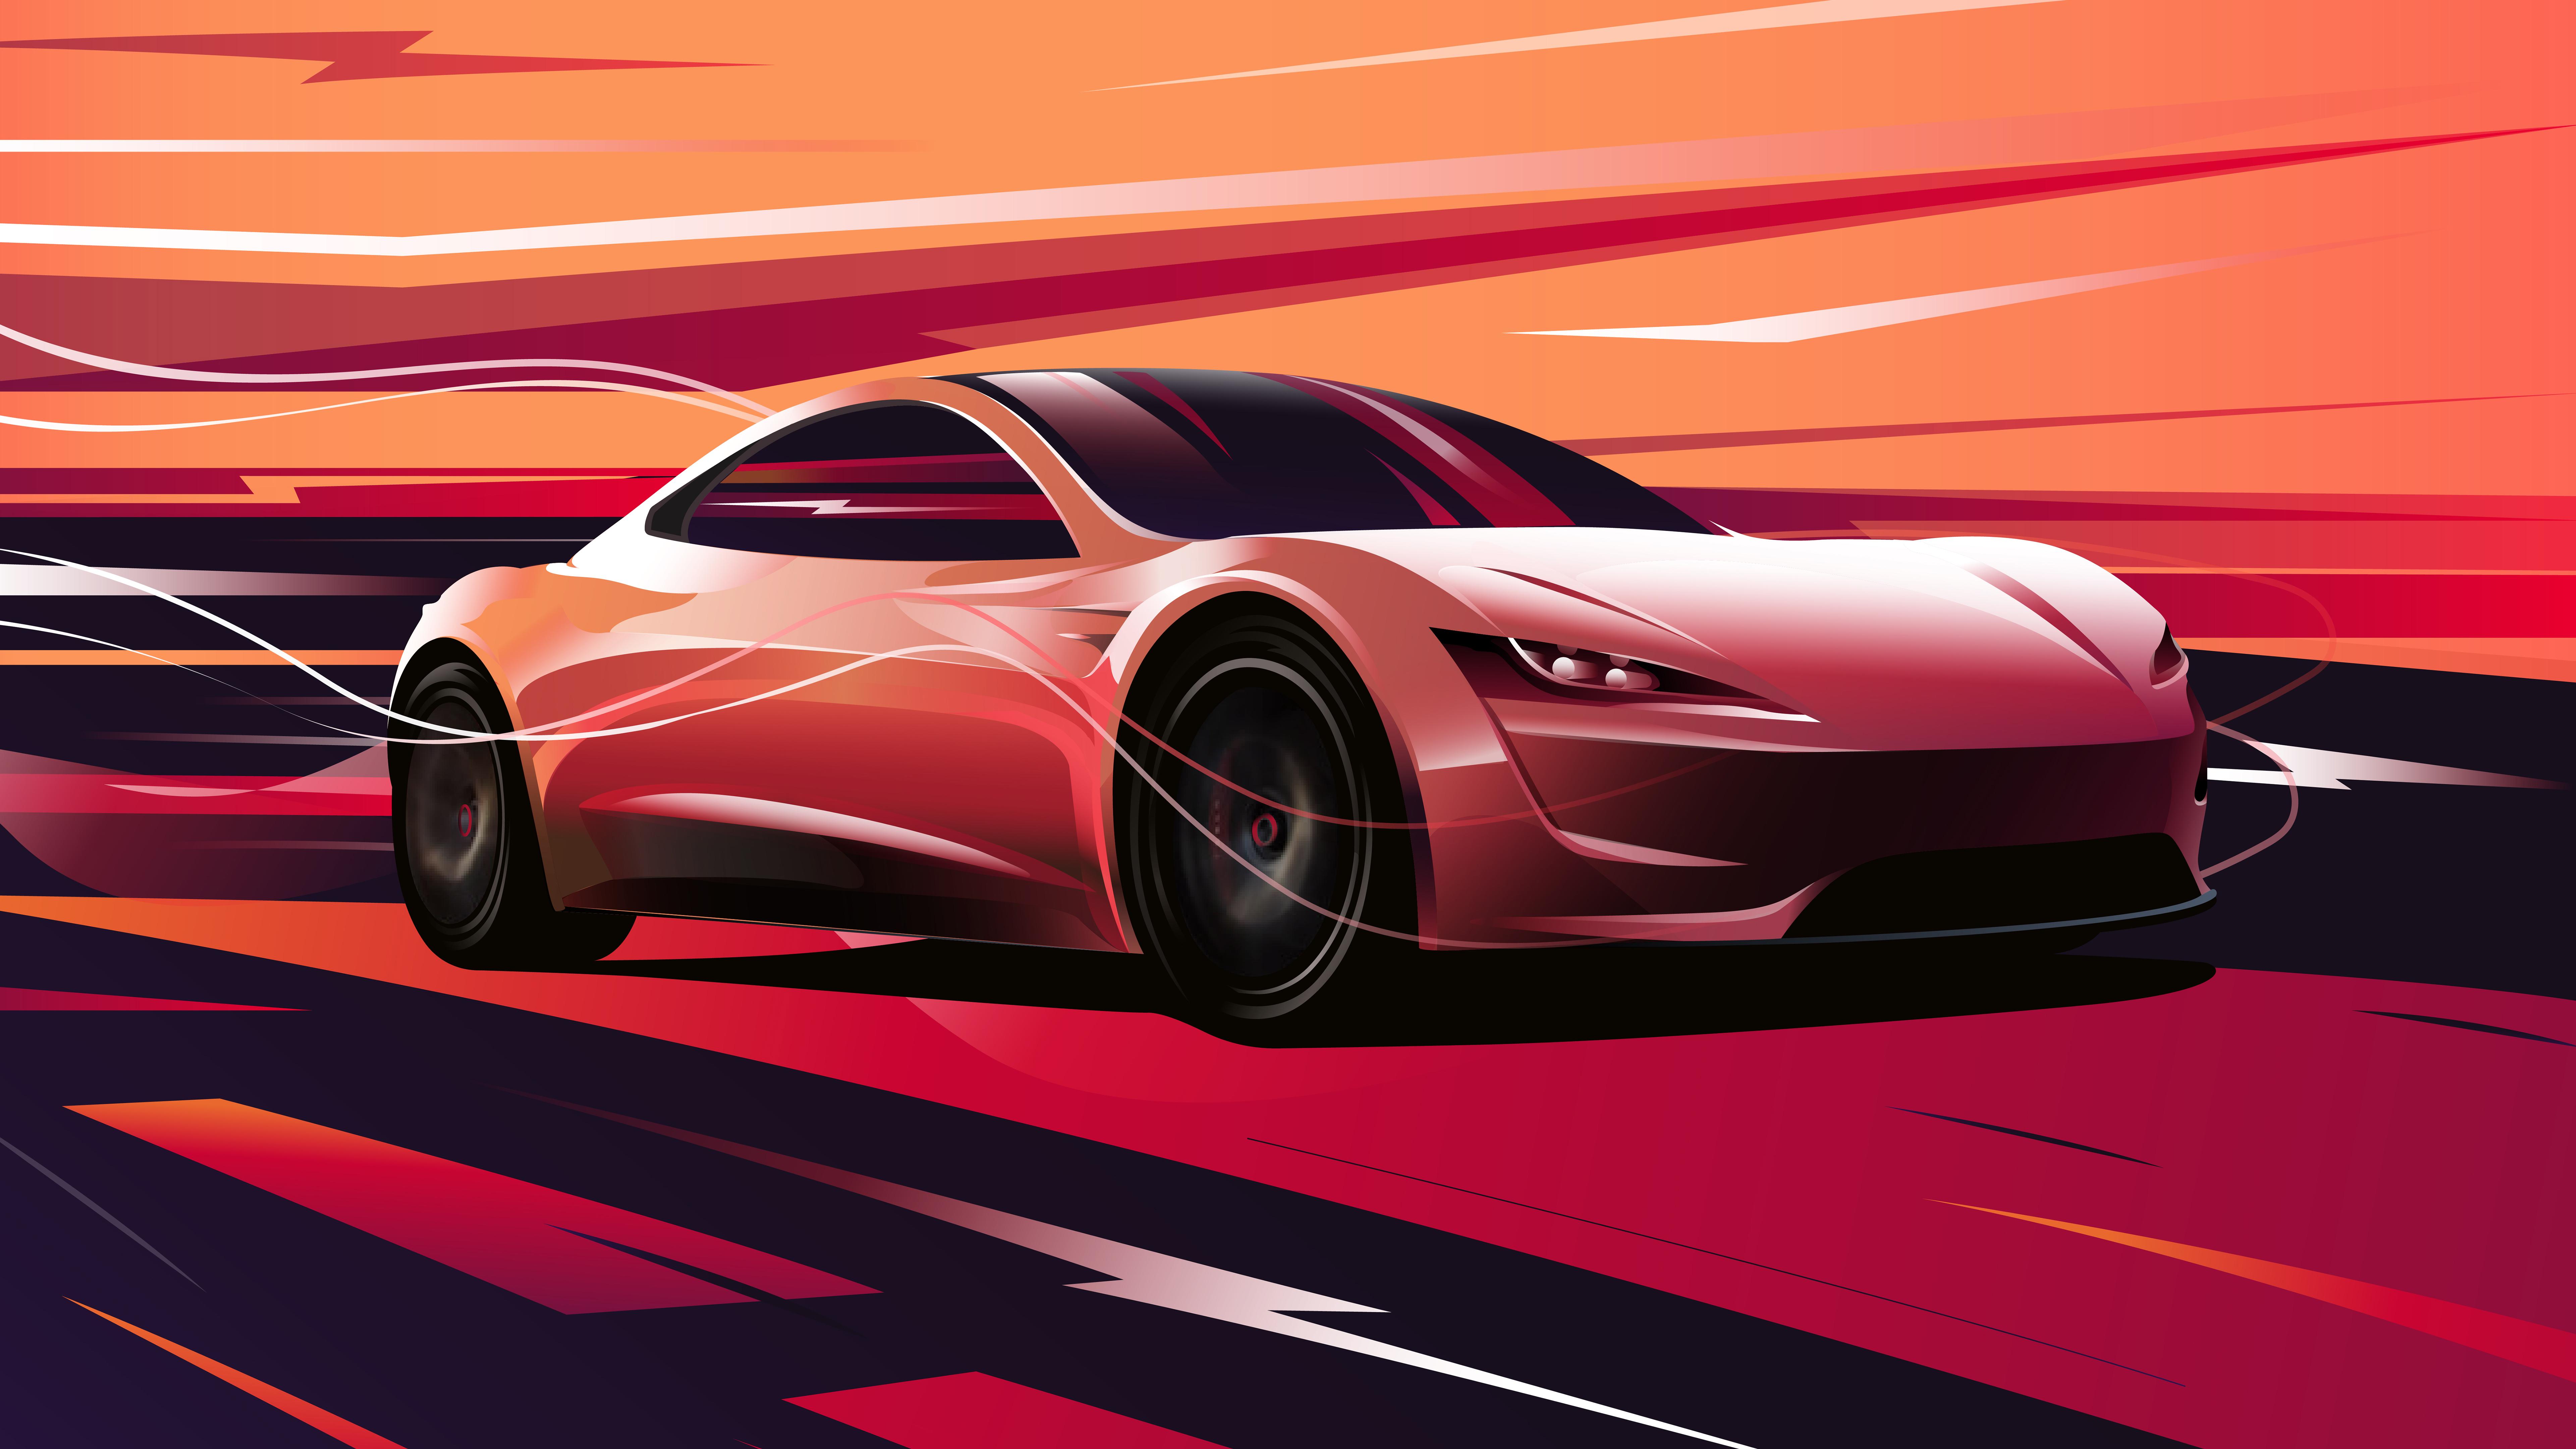 Tesla Roadster 2020 4K 8K Wallpapers HD Wallpapers 7680x4320